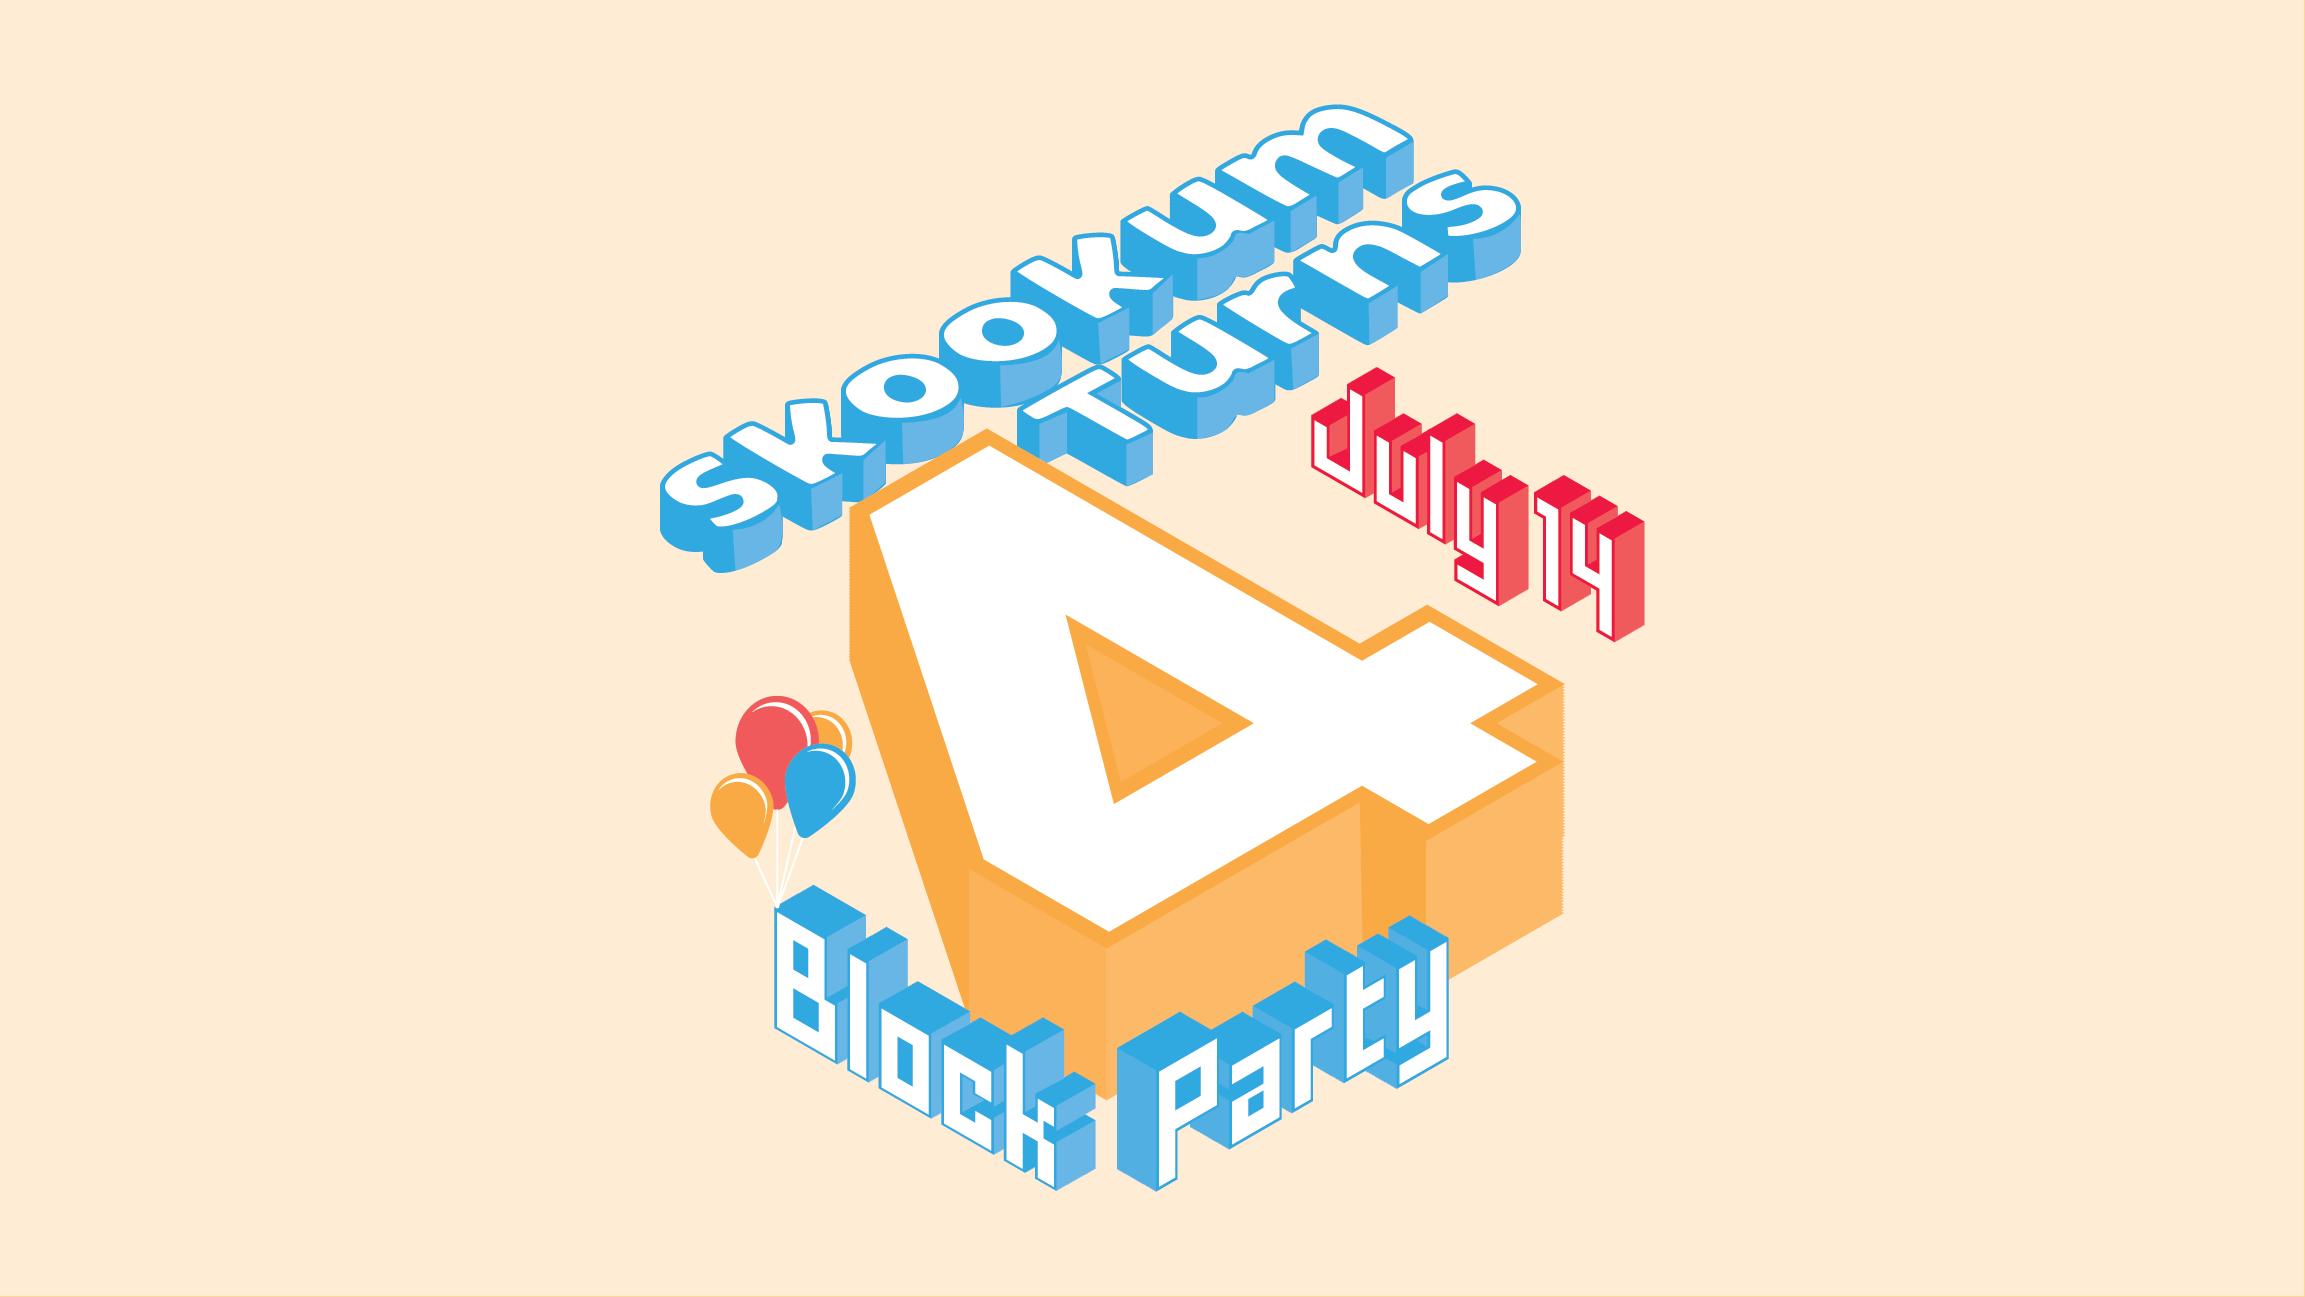 Block_party_facebook_1 (1).png